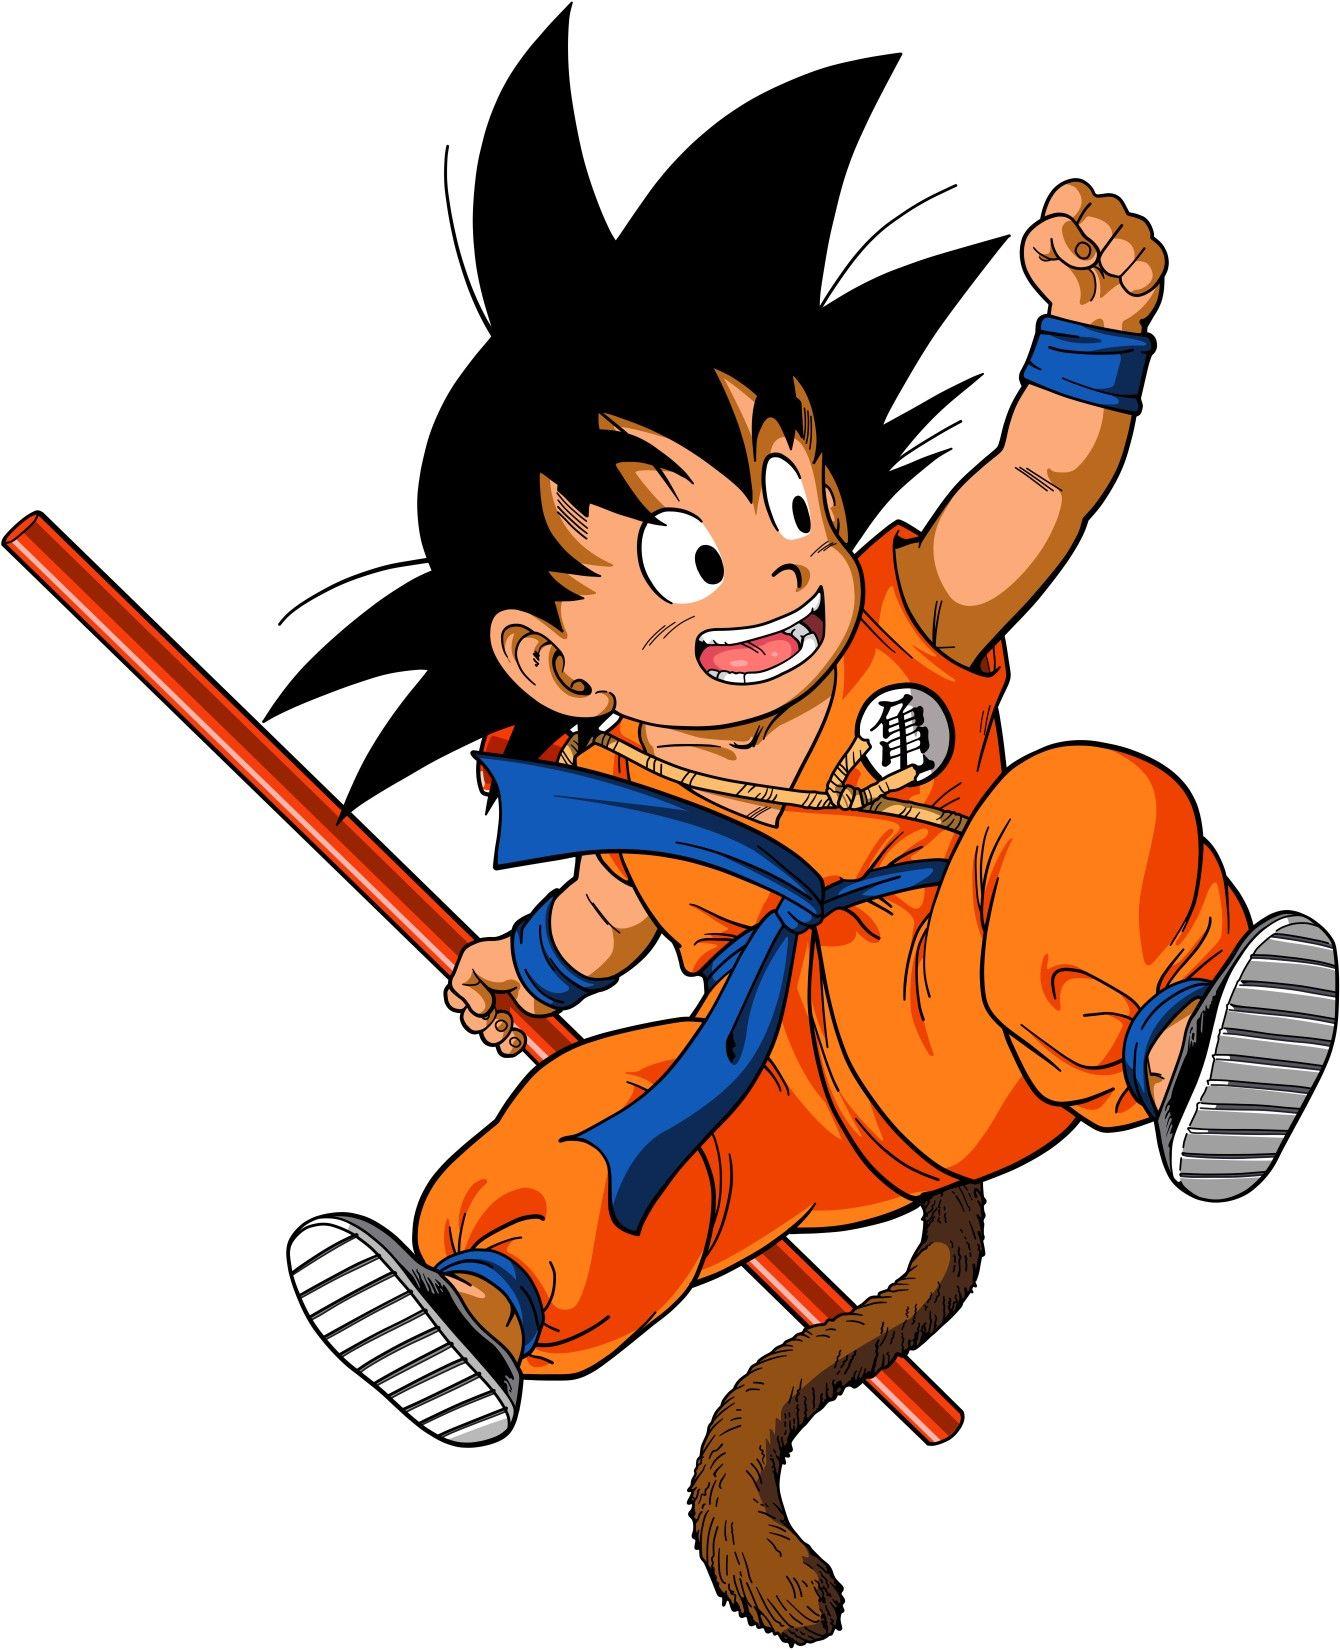 Pin De Valentin Naulleau En Lego Personajes De Goku Personajes De Dragon Ball Goku Nino